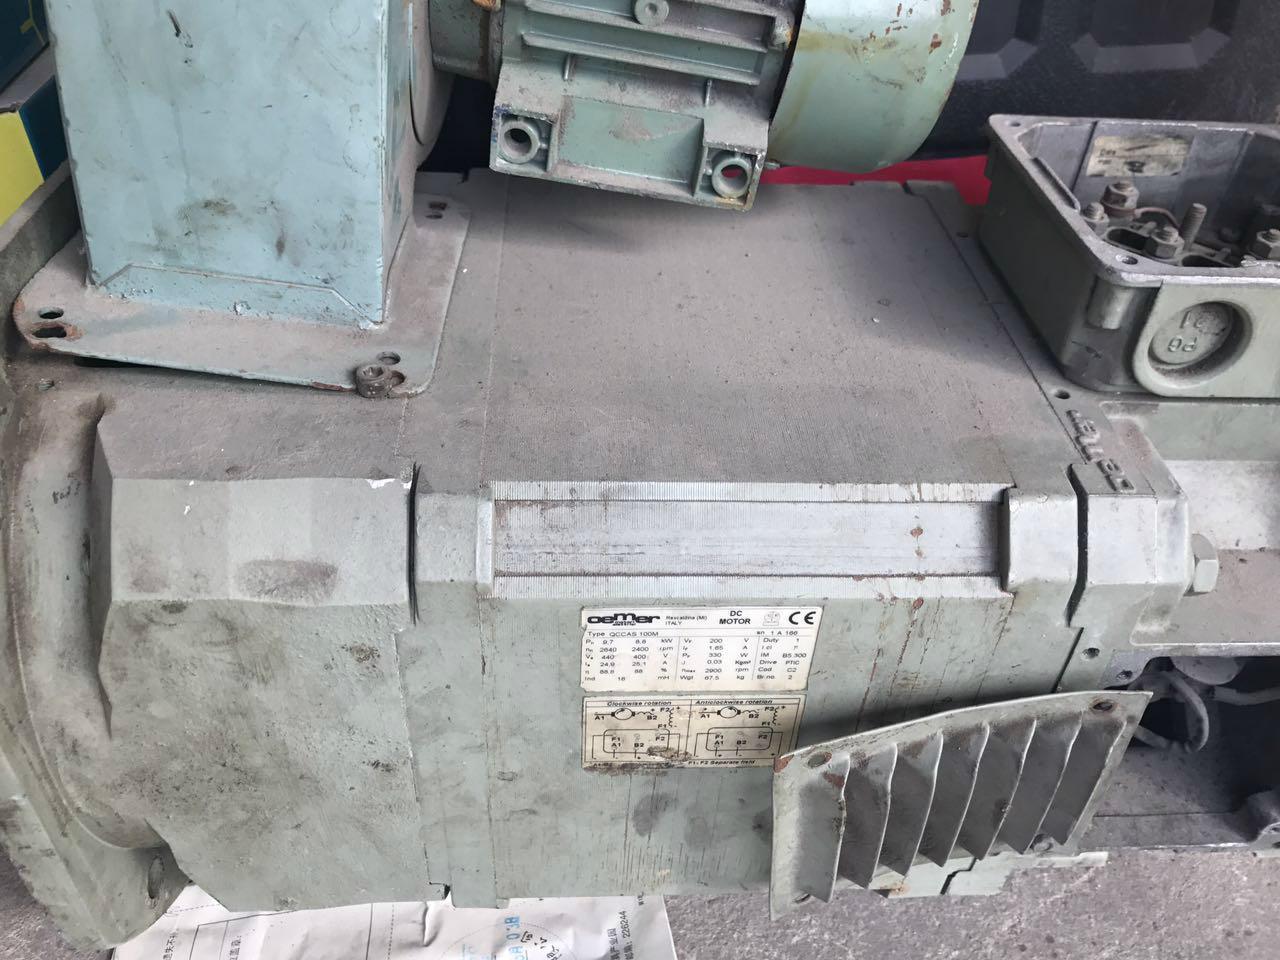 oemer qccas 100m 8.8kw直流电机出售维修 1